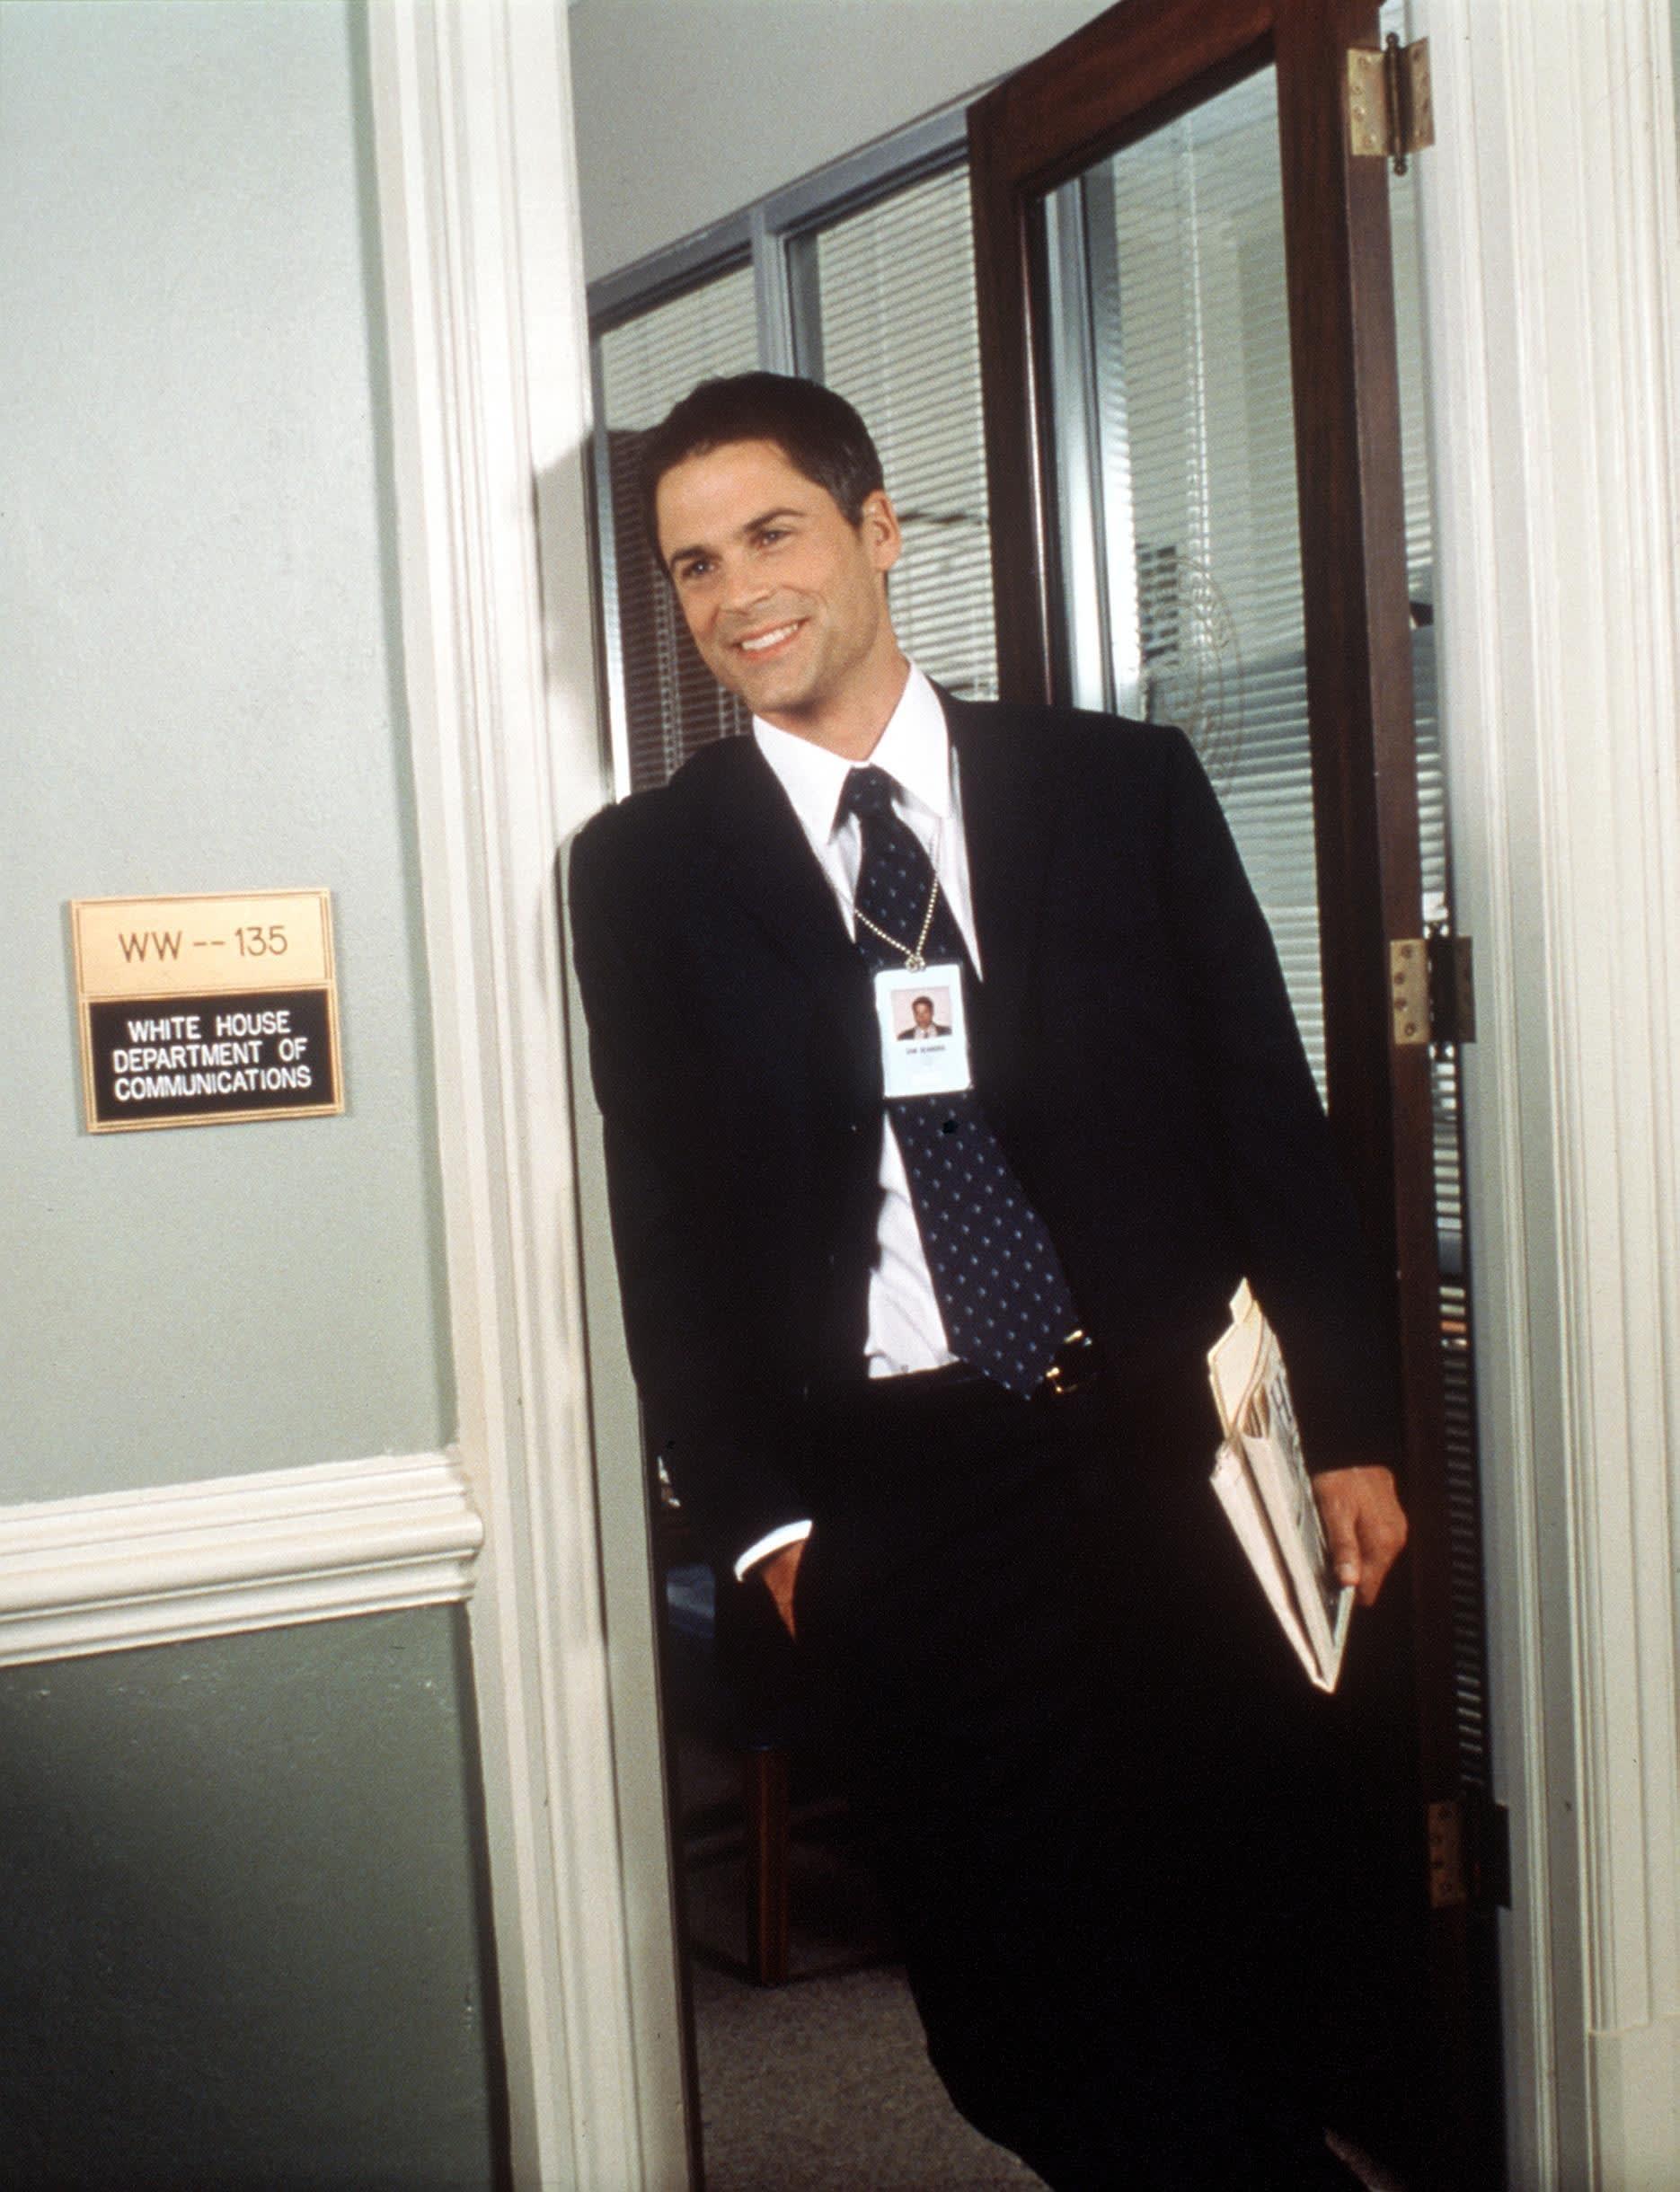 Rob Lowe in a doorway